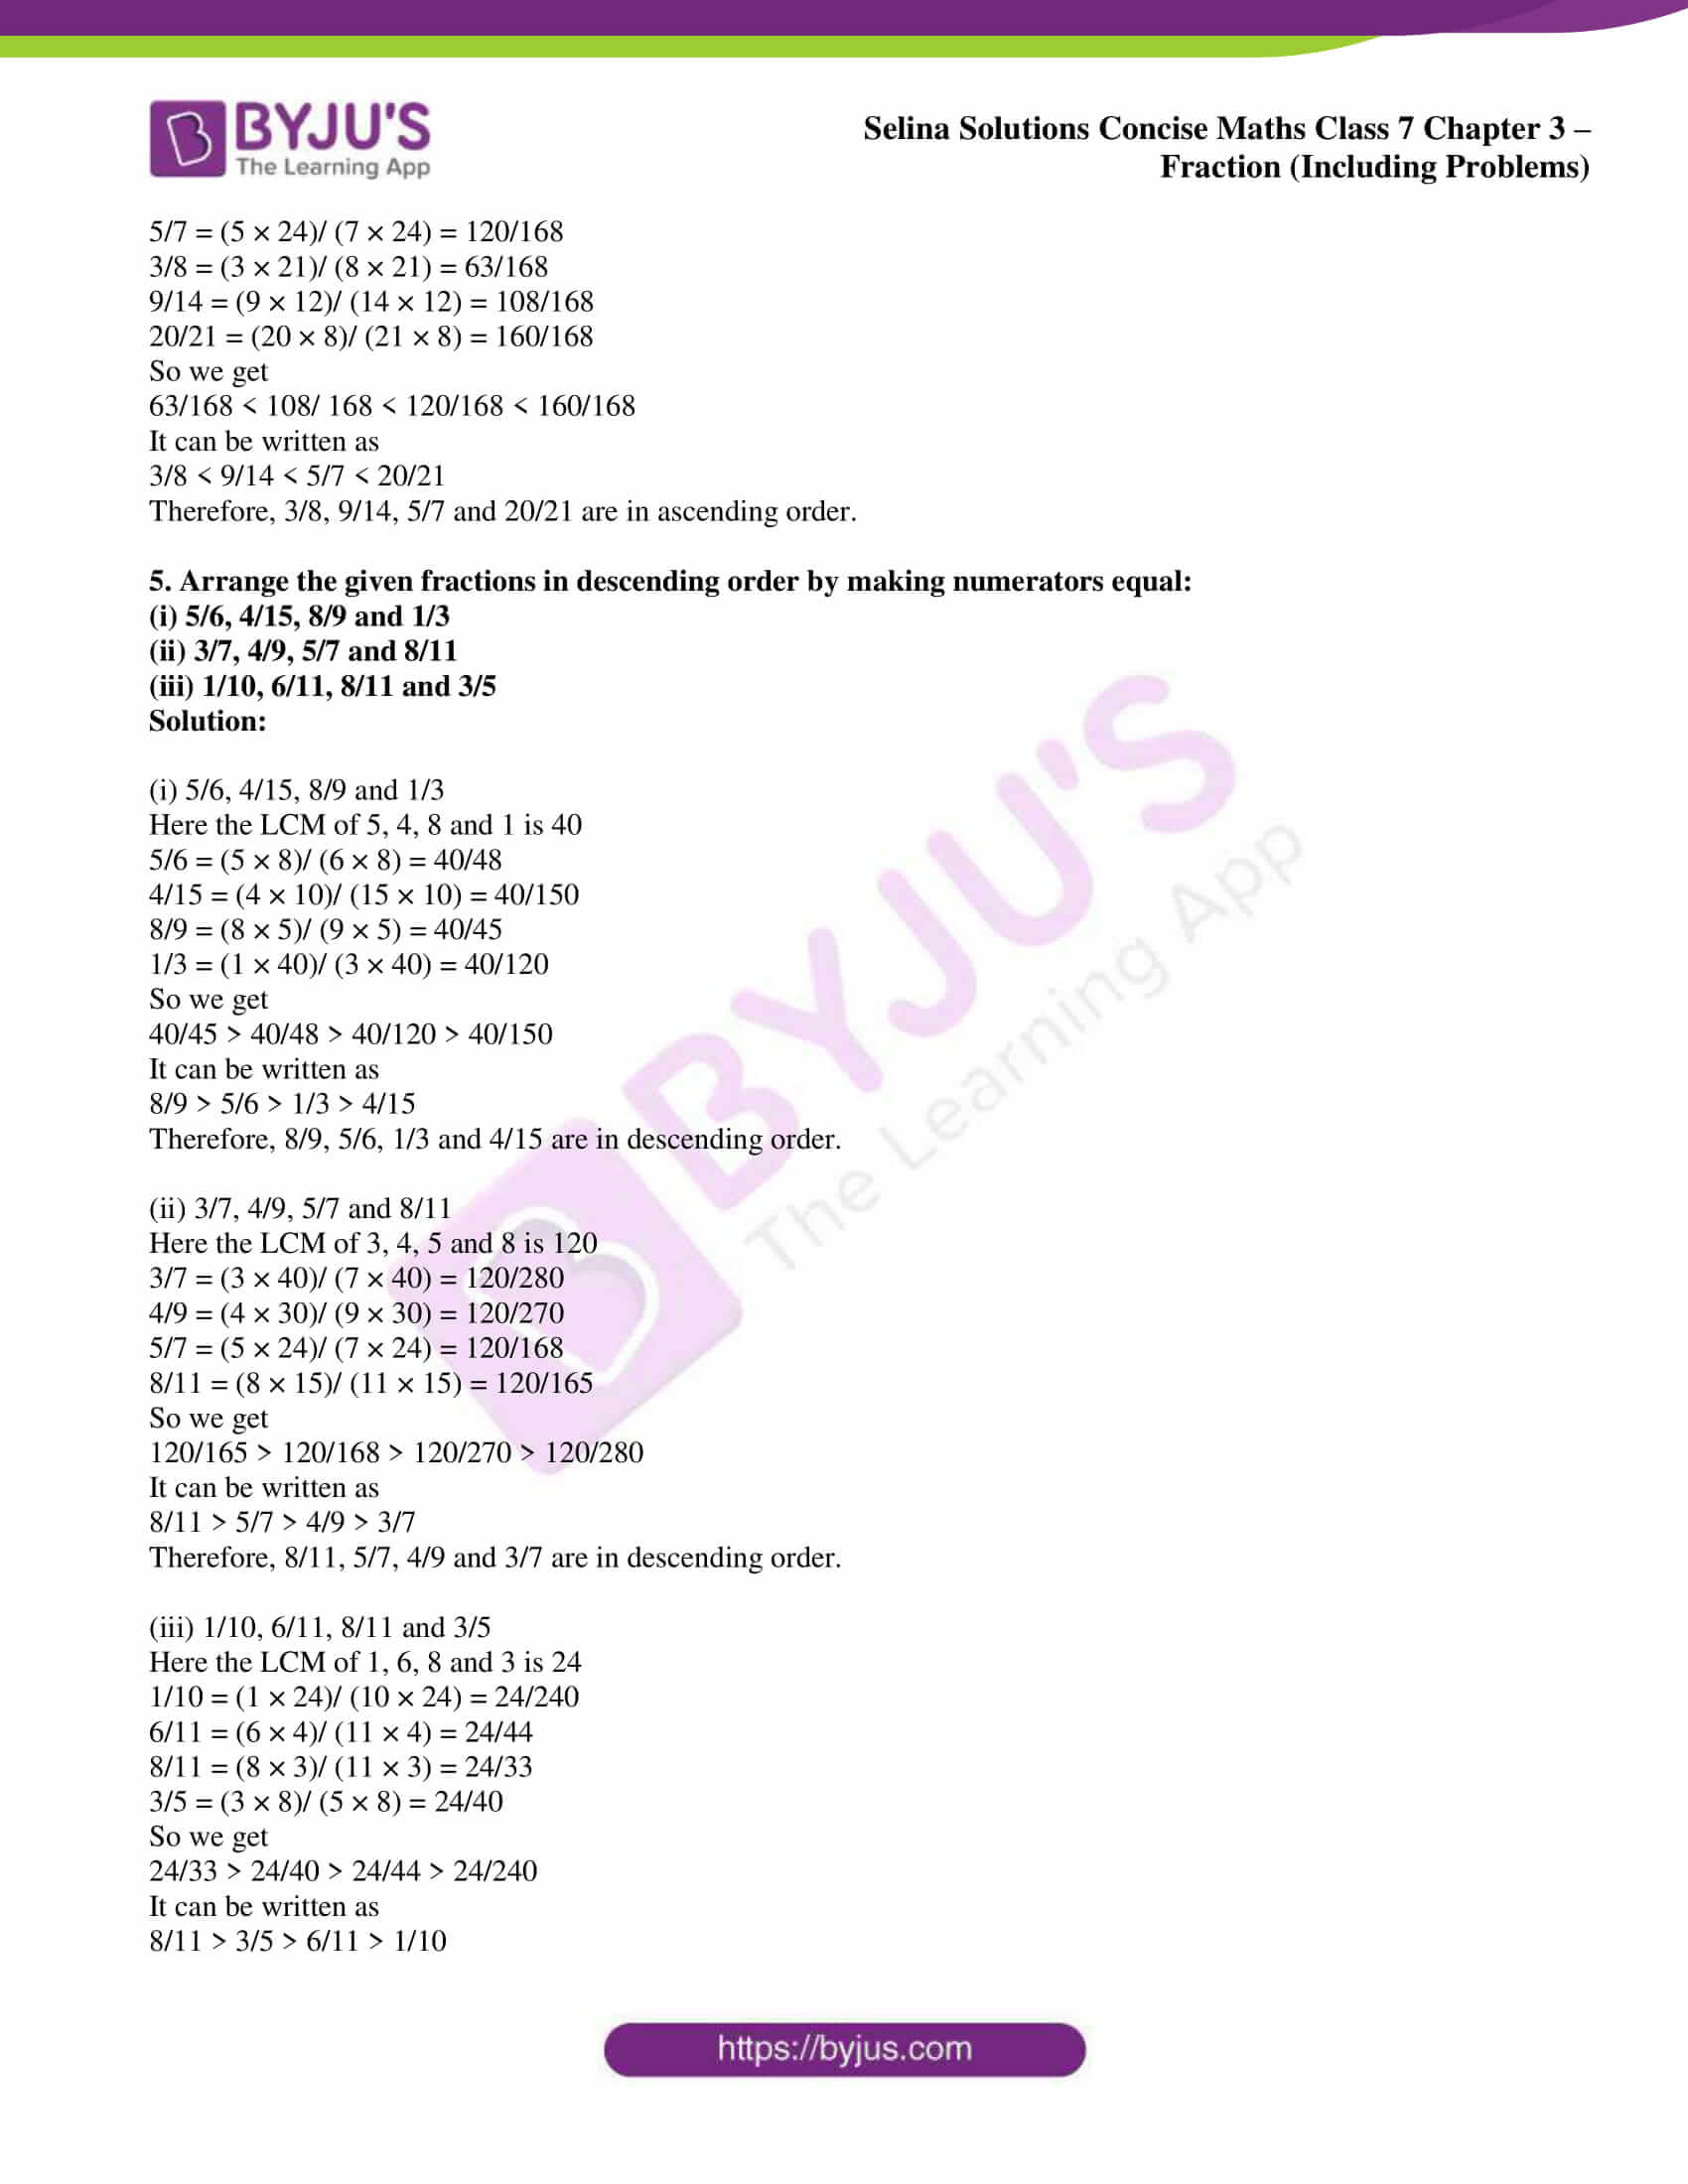 selina sol concise maths class 7 ch3 ex 3b 3